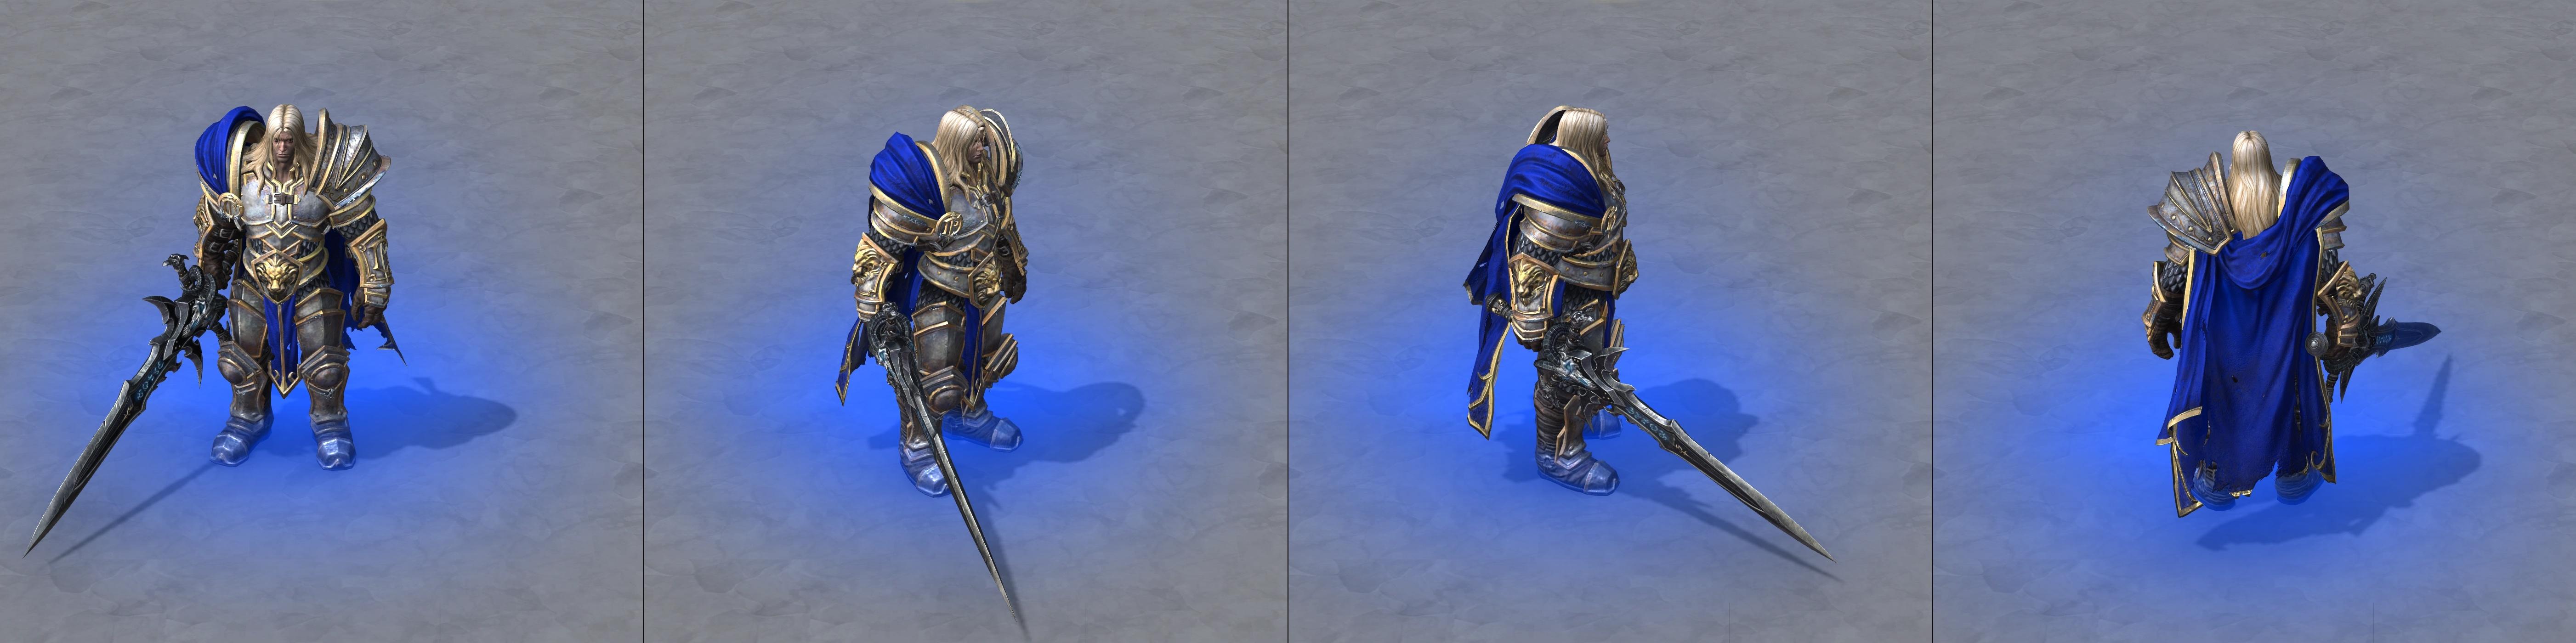 Warcraft III Reforged : Arthas avec Frostmourne